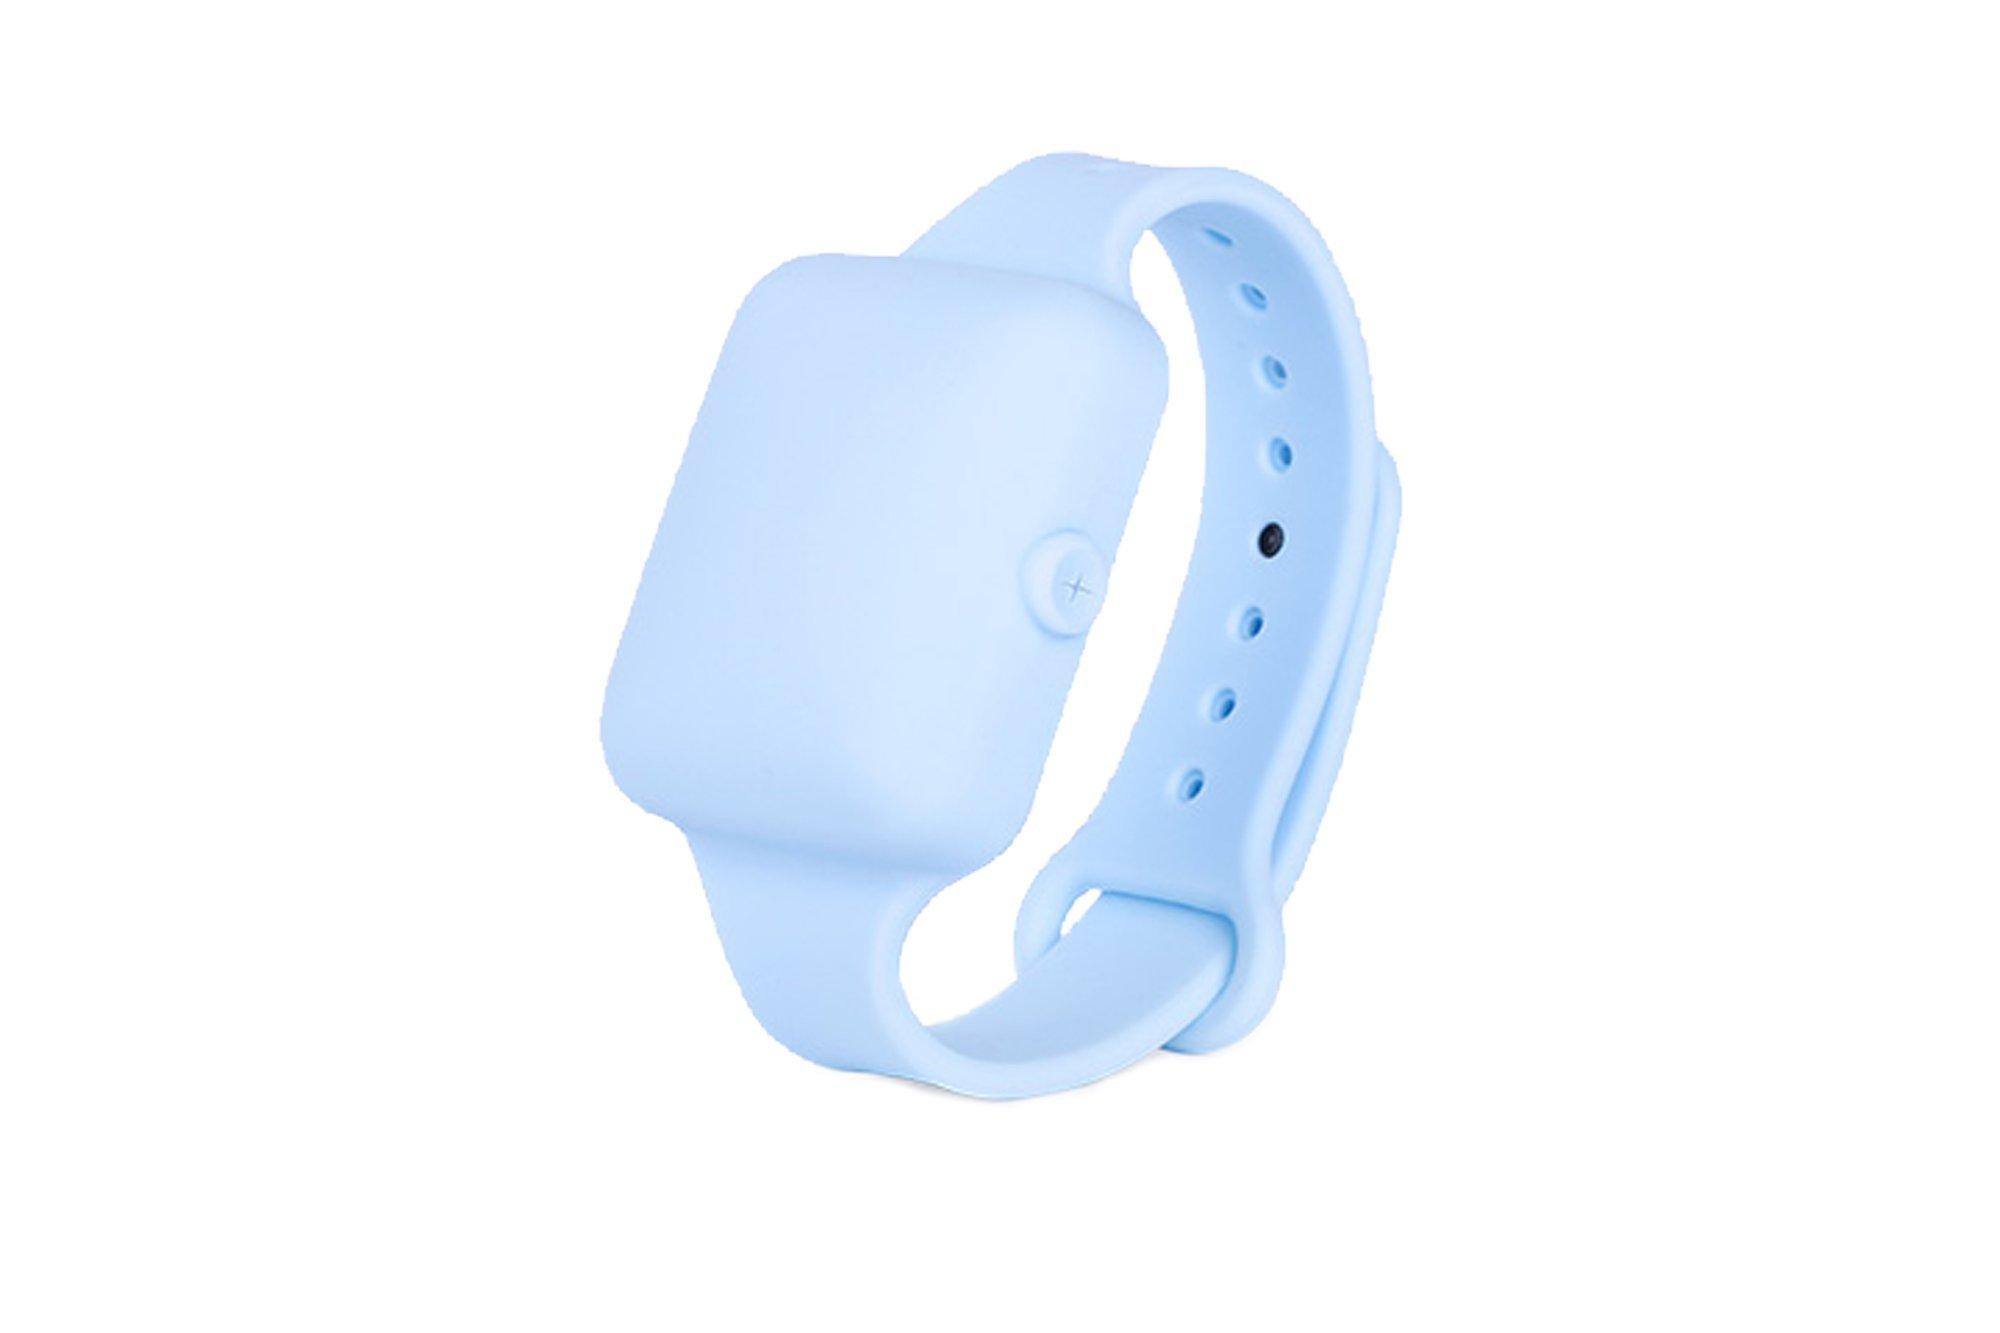 Händedesinfektionsmittel Armband Spender Dezyband